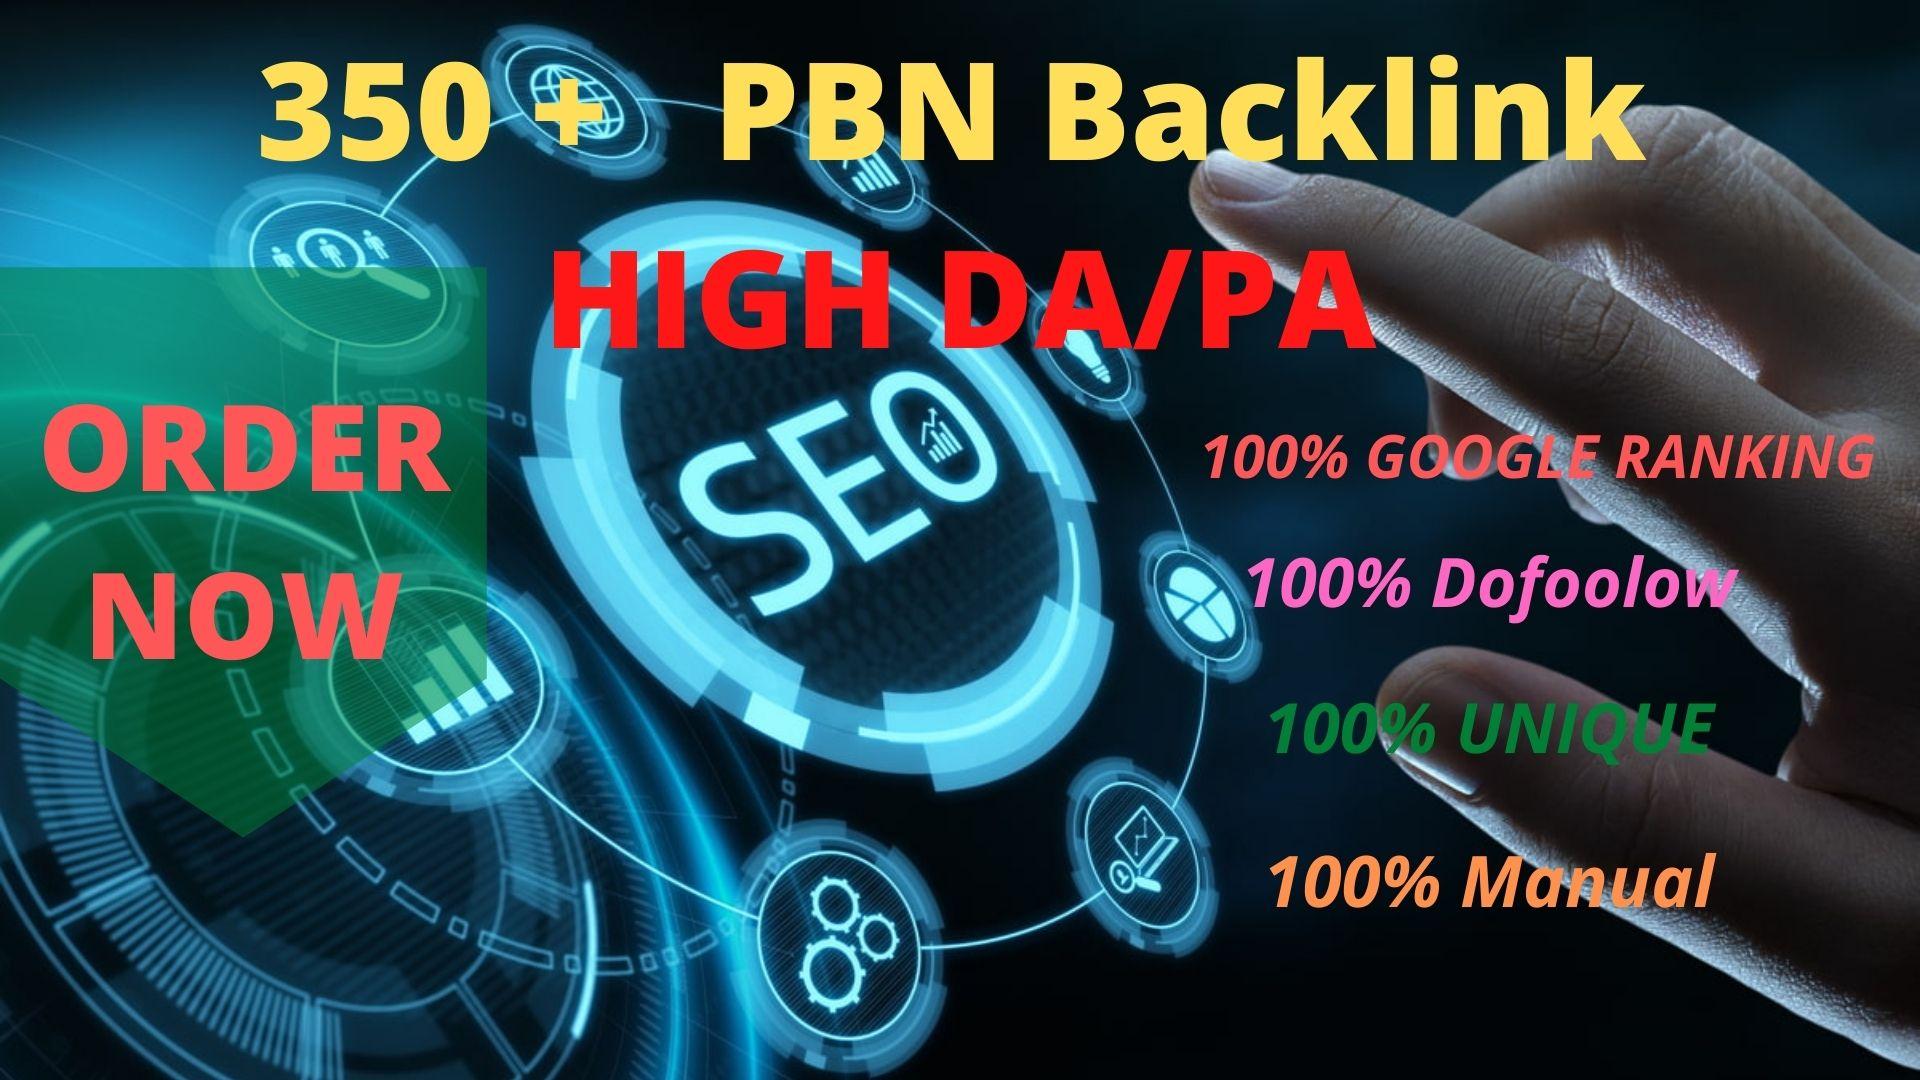 GET 350+ High PBN Backlink Rank your Google site.